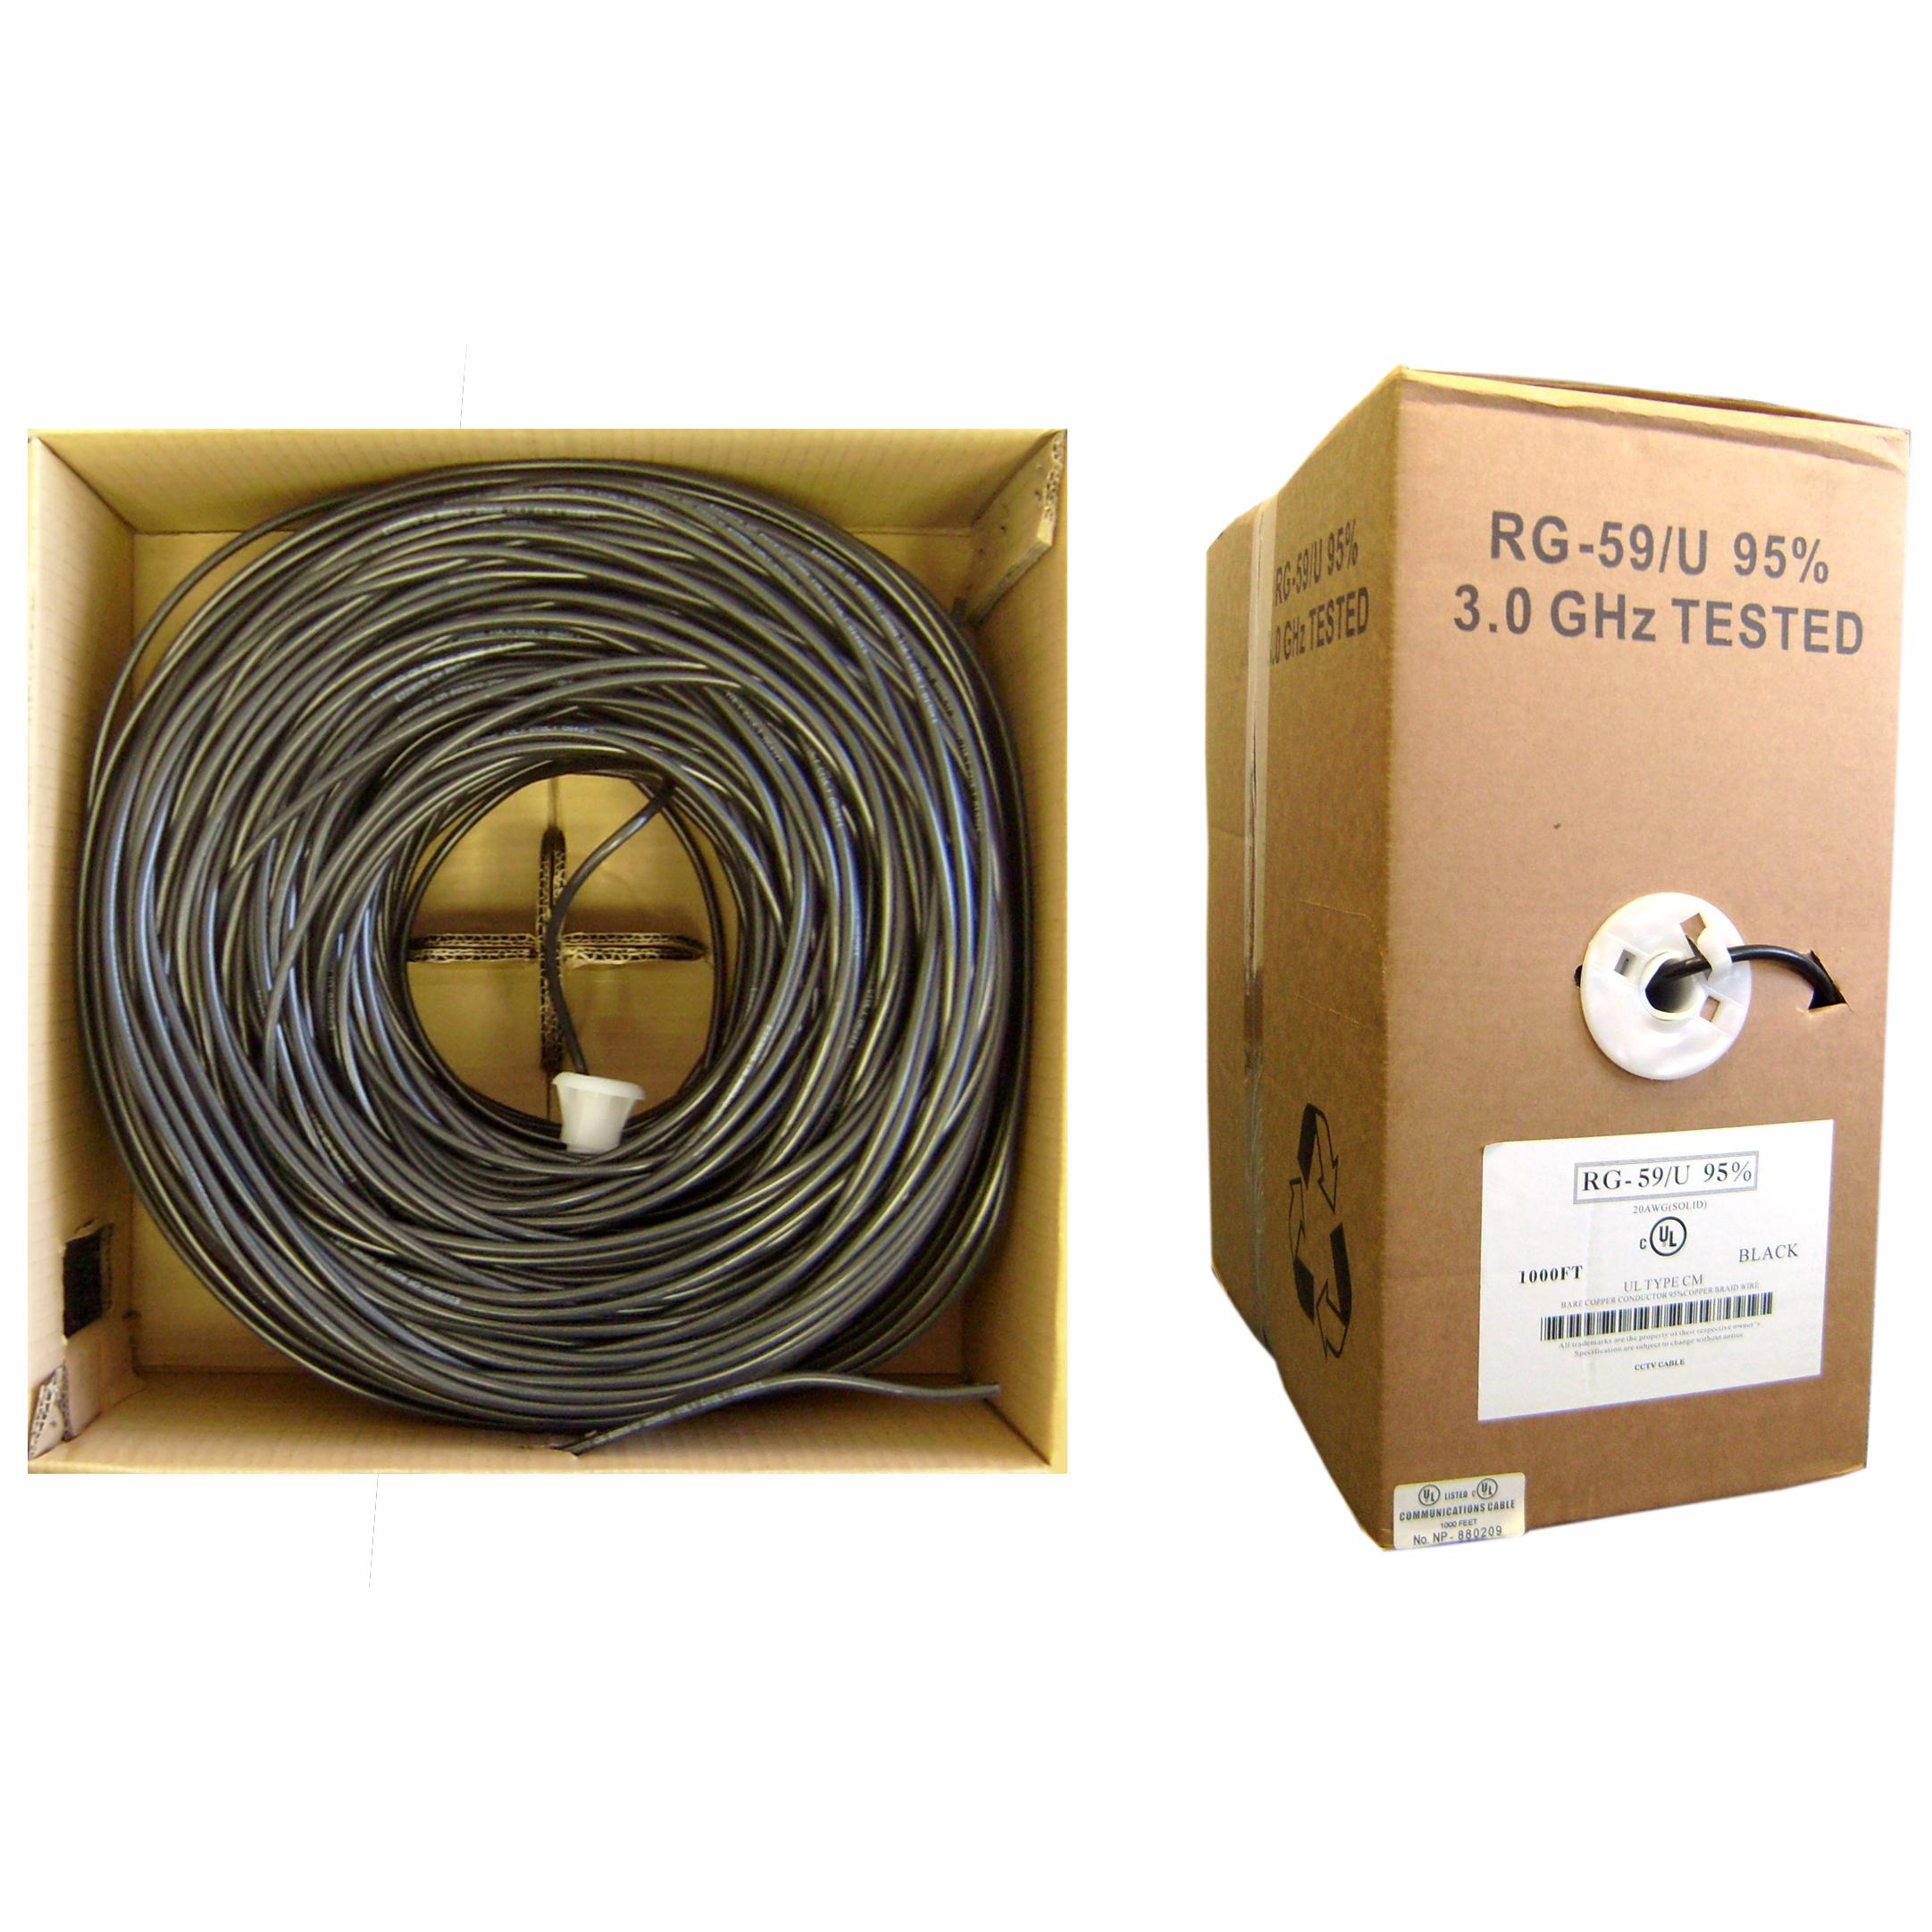 1000ft Black Bulk RG59/U Coaxial Cable, 20 AWG, Pullbox